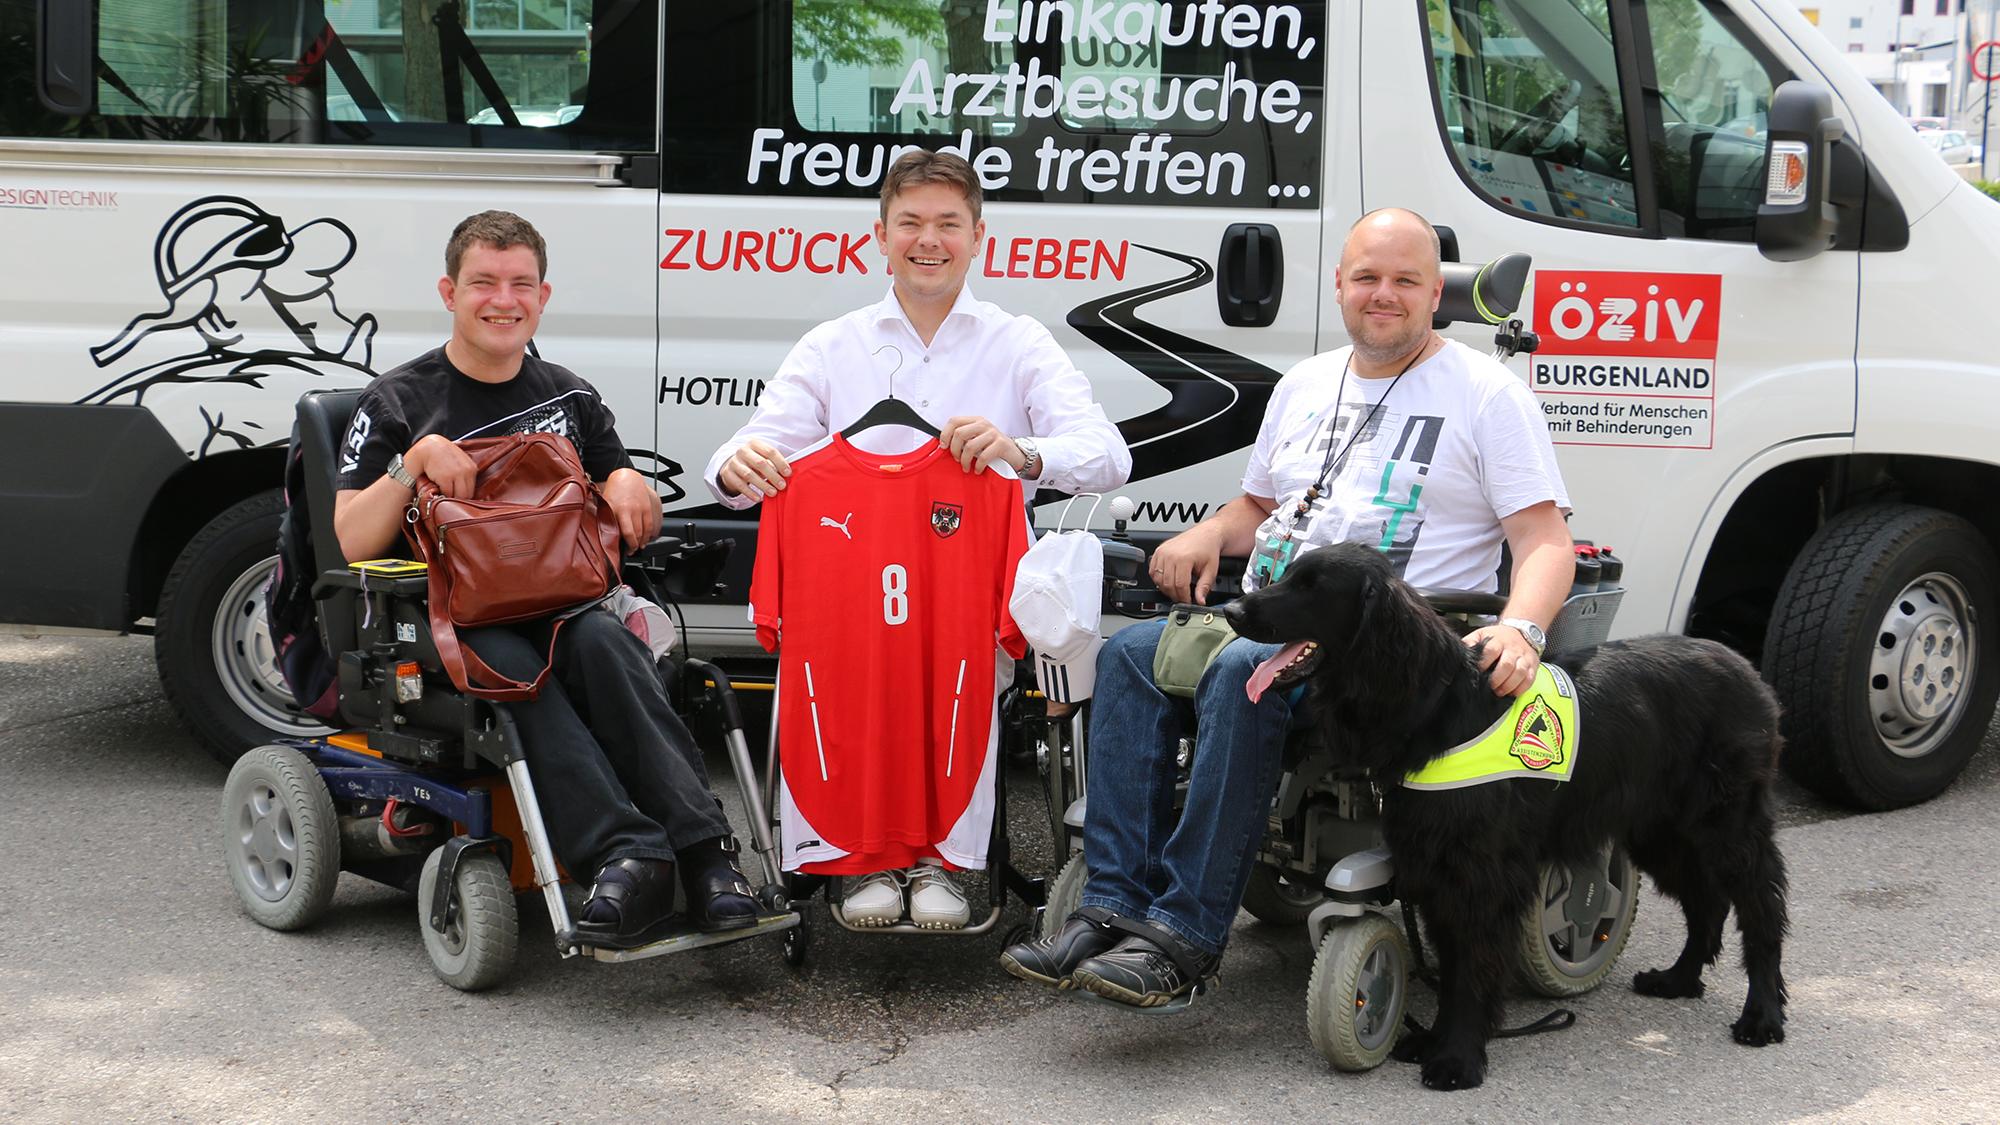 Team ÖZIV-Burgenland